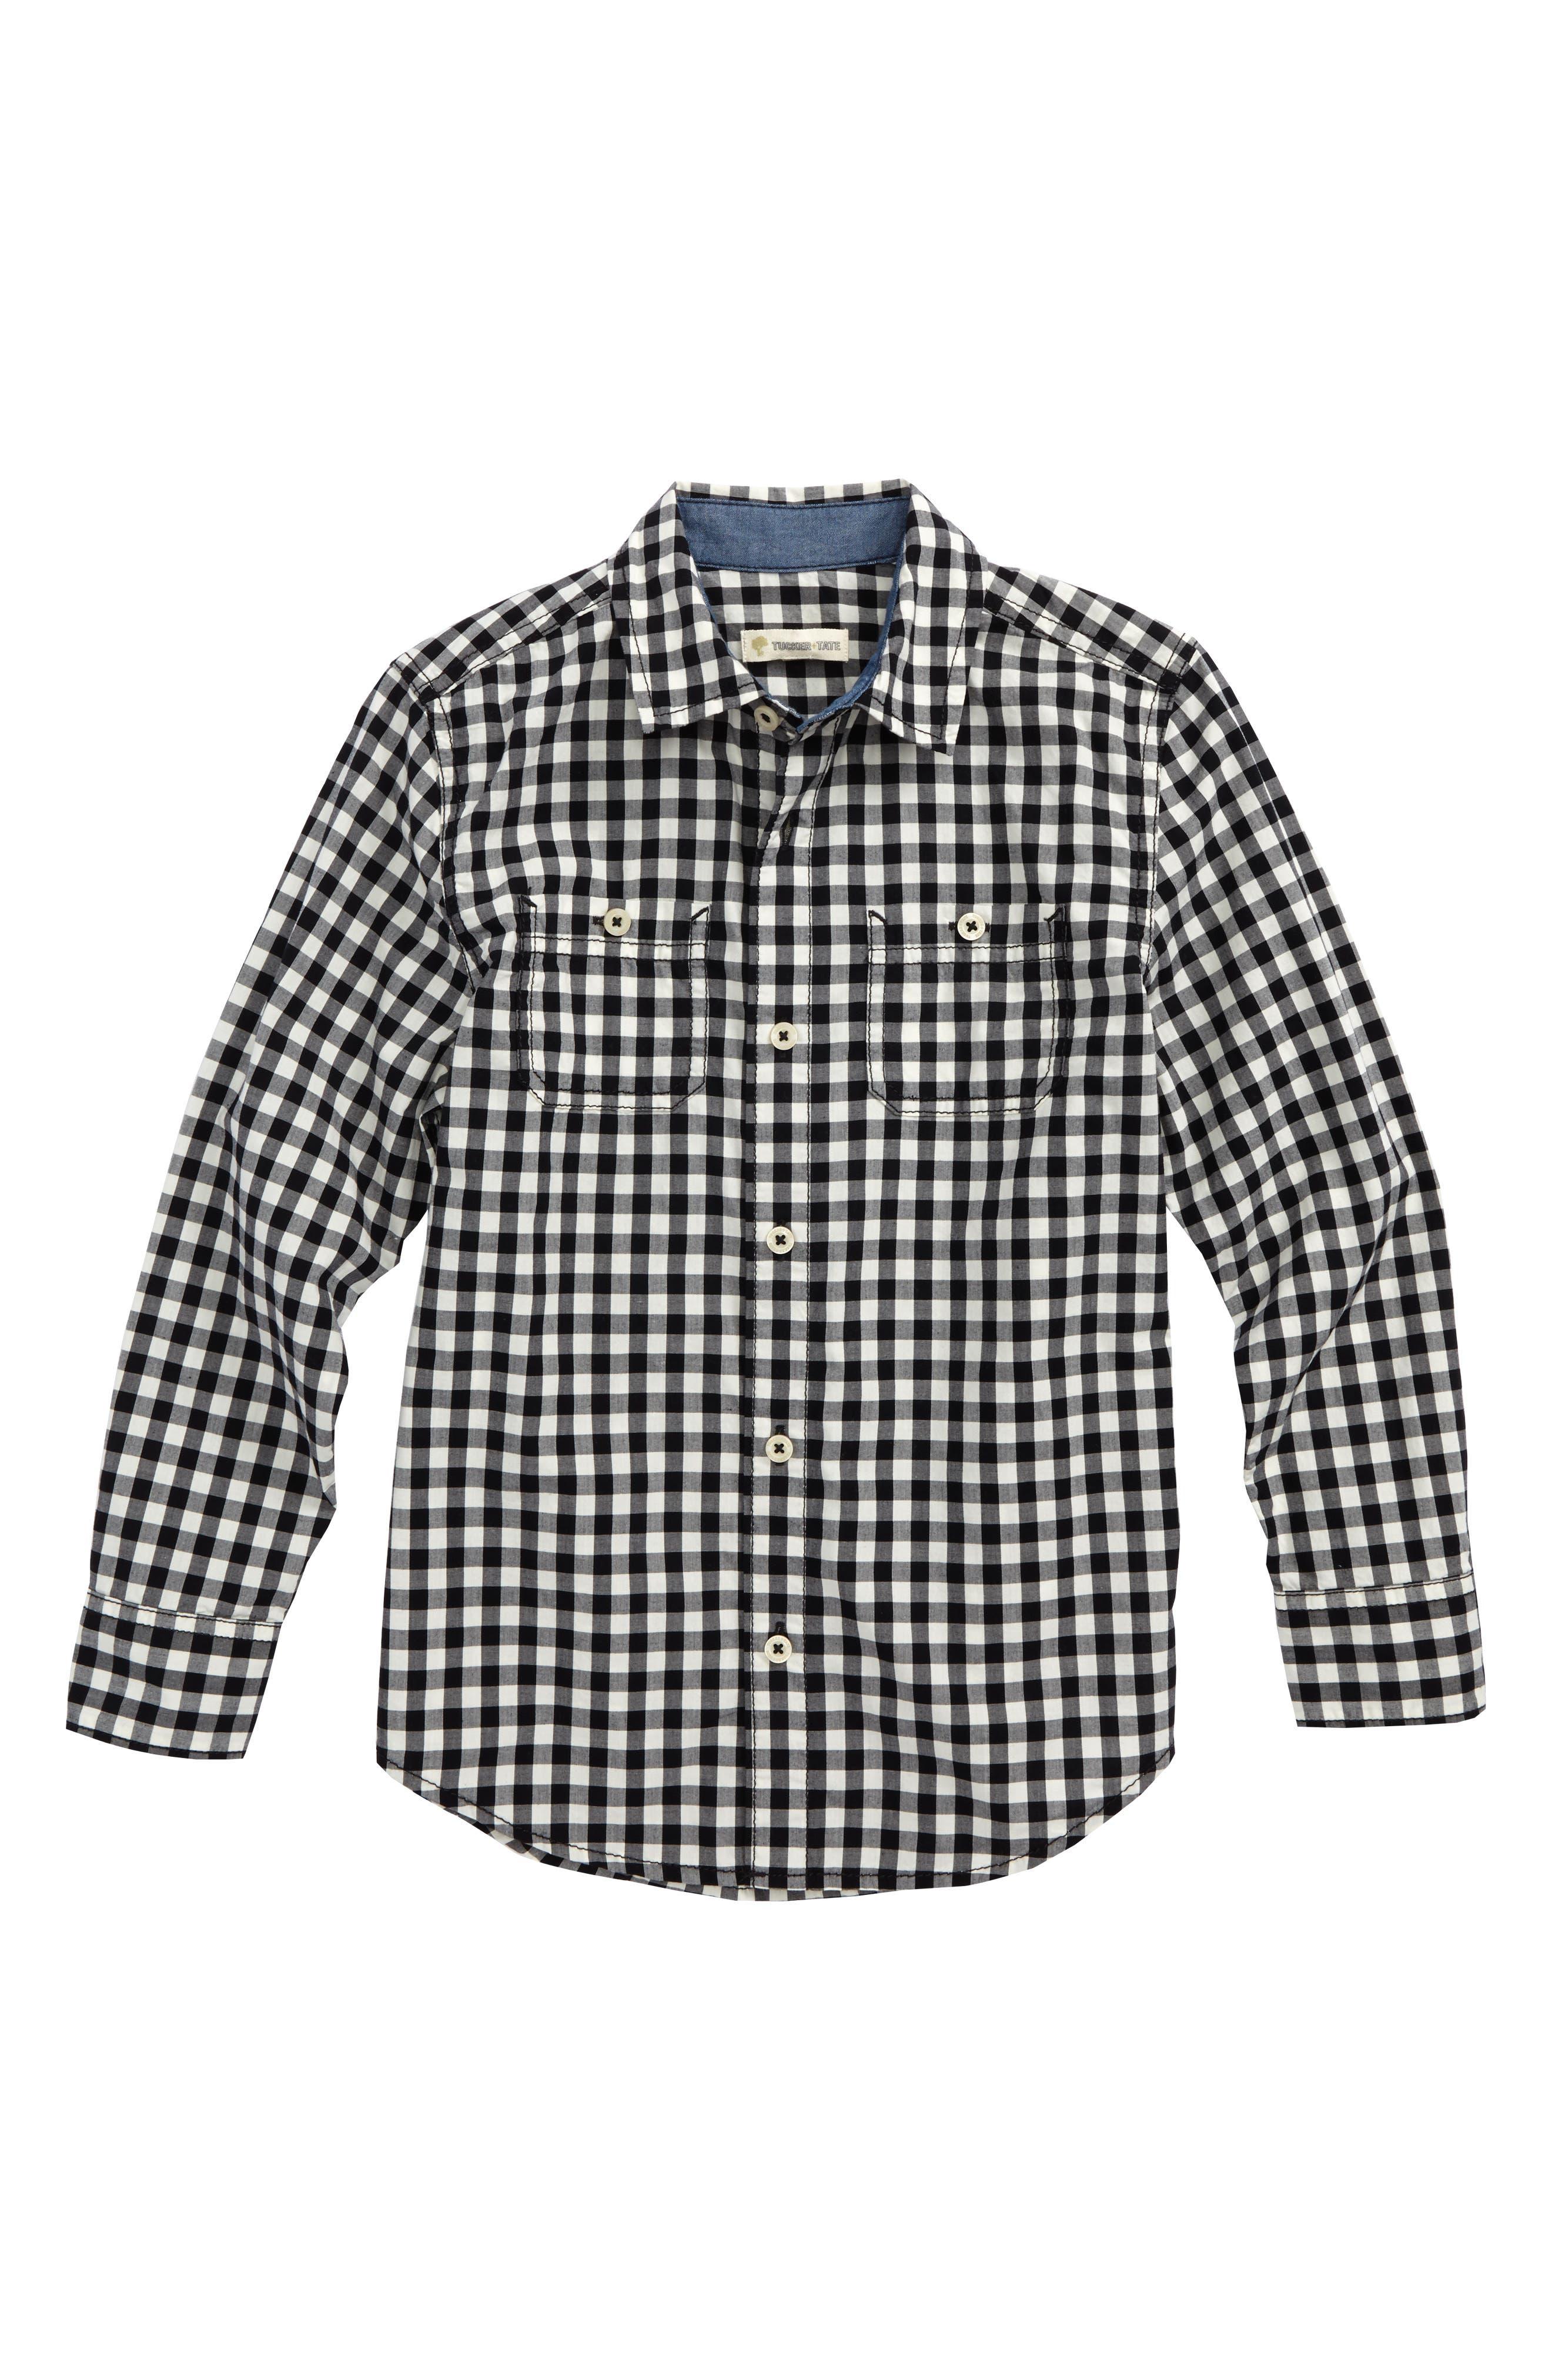 Tucker + Tate 'Photo' Buffalo Plaid Woven Shirt (Little Boys)